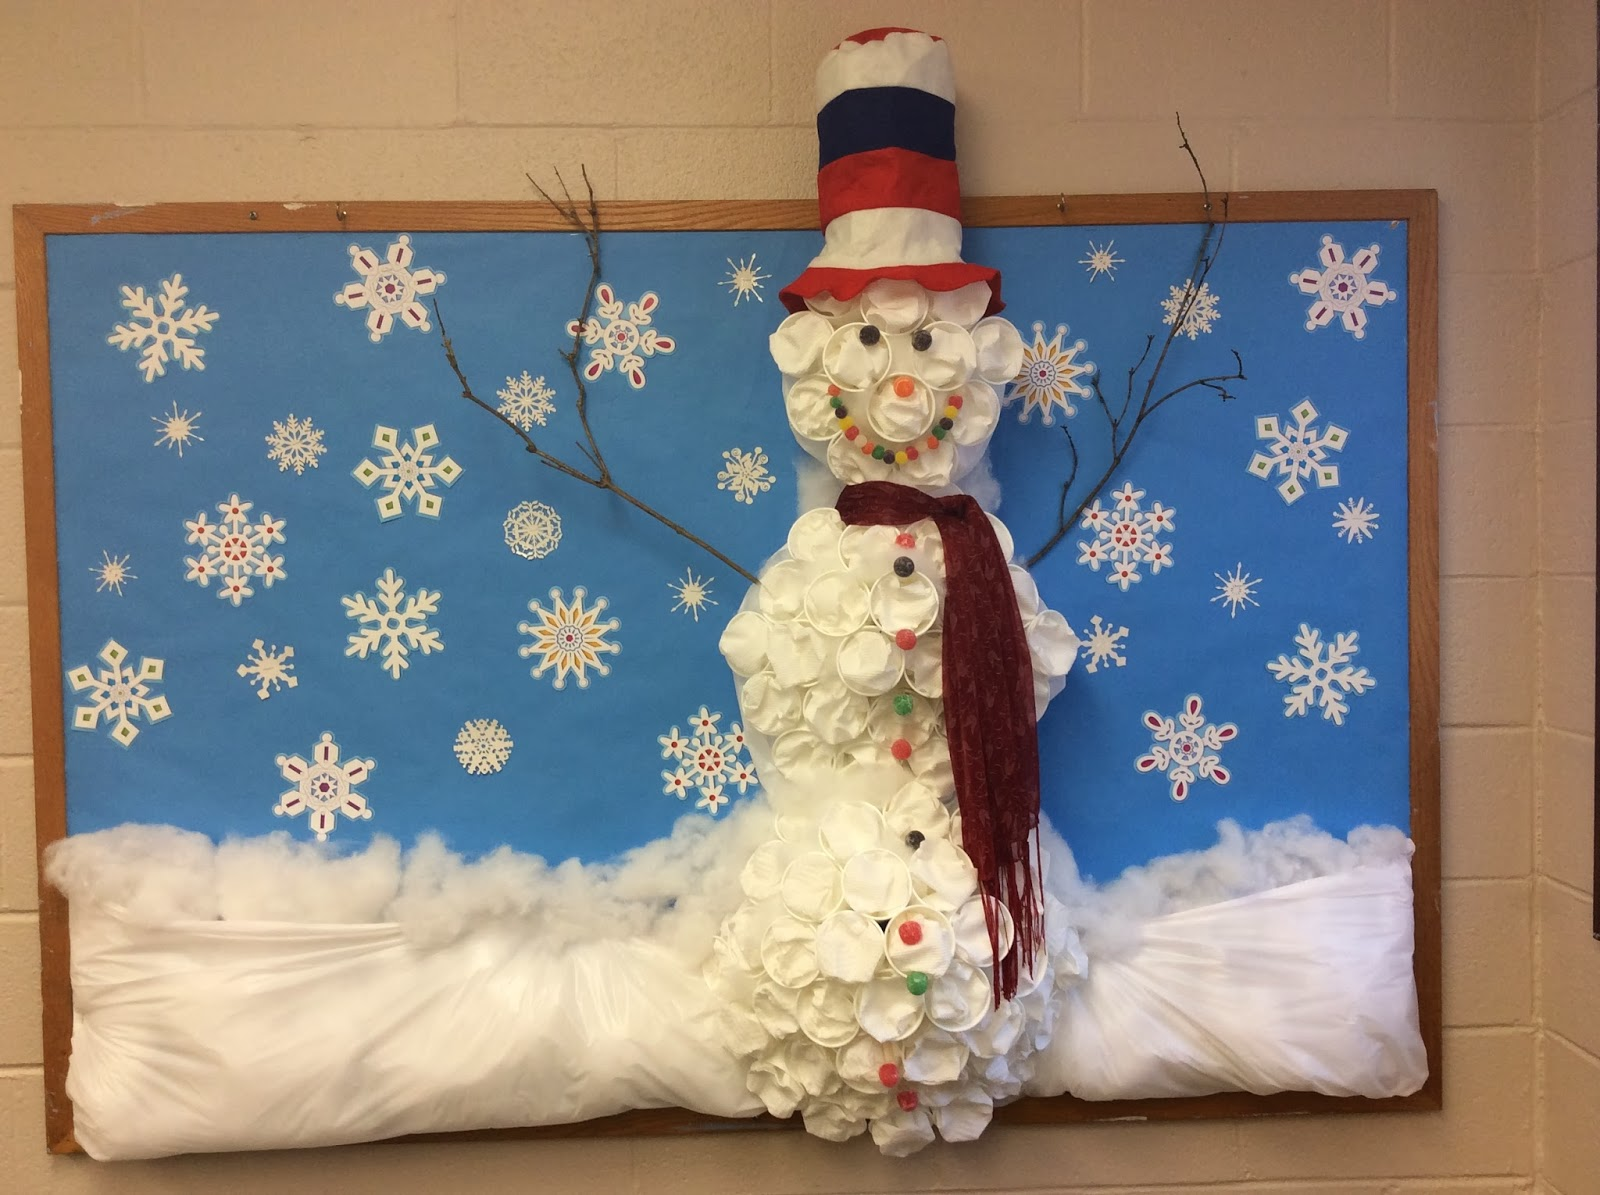 Calendar Bulletin Board Ideas Middle School : Creative back to school bulletin boards middle